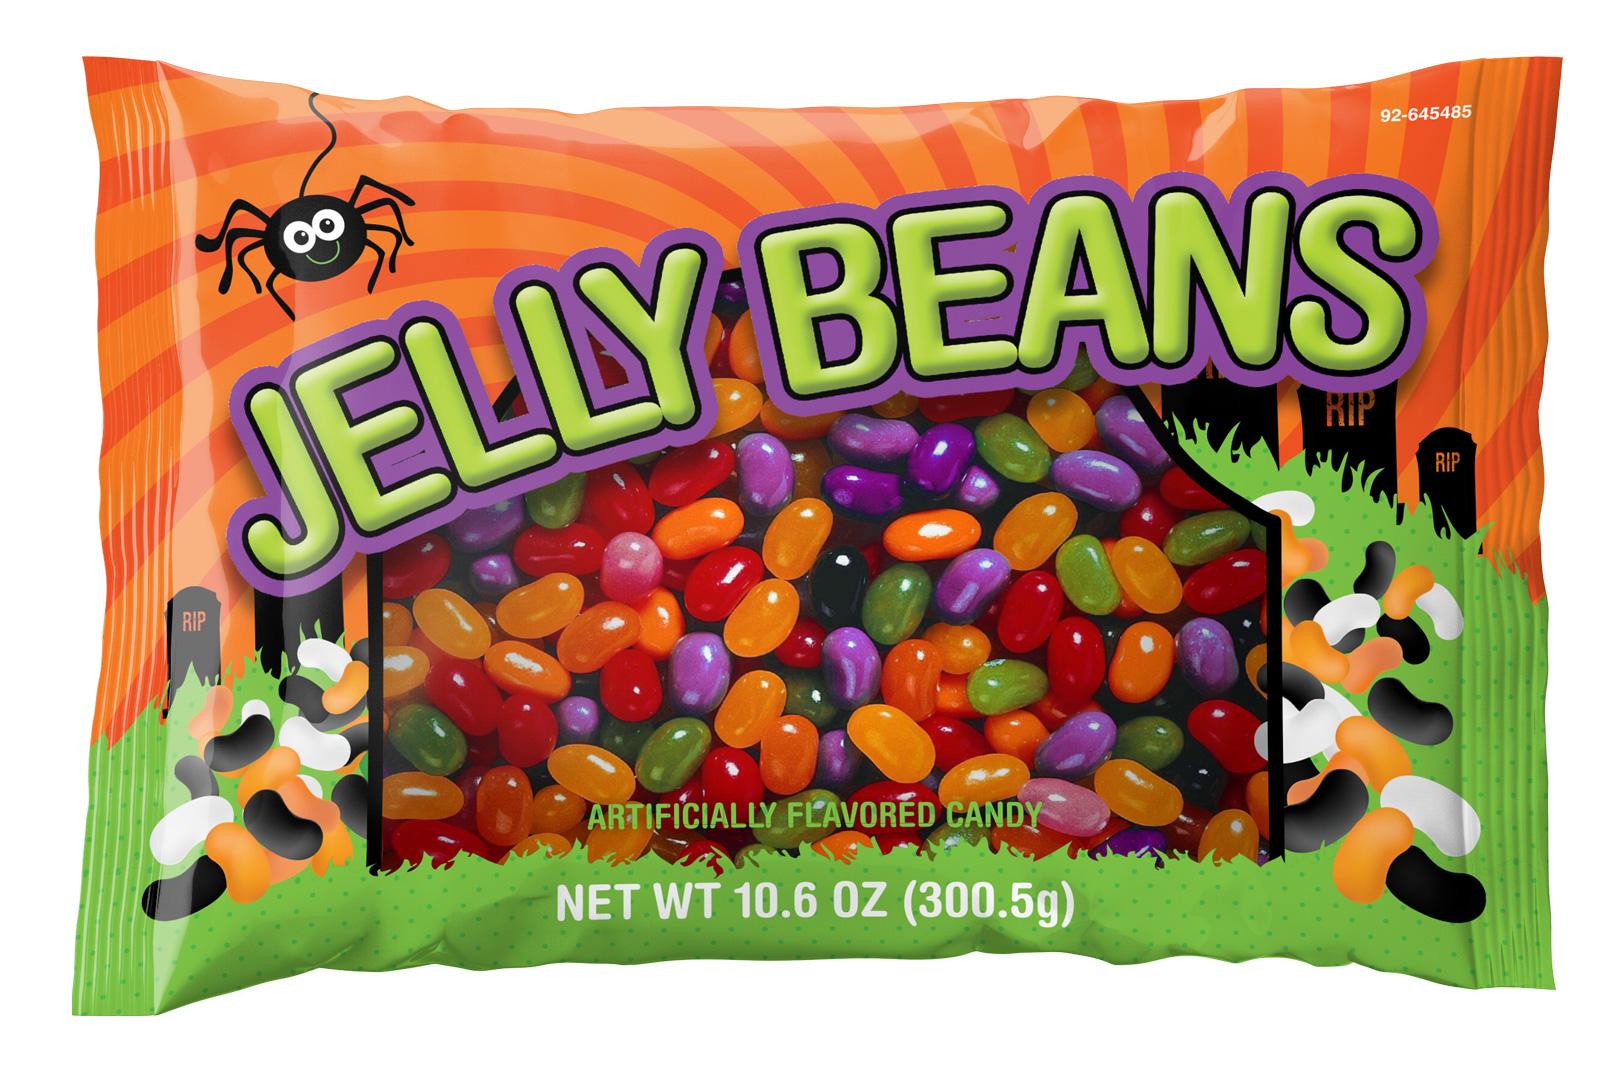 jellybeansmockup - 2017 Halloween Candy